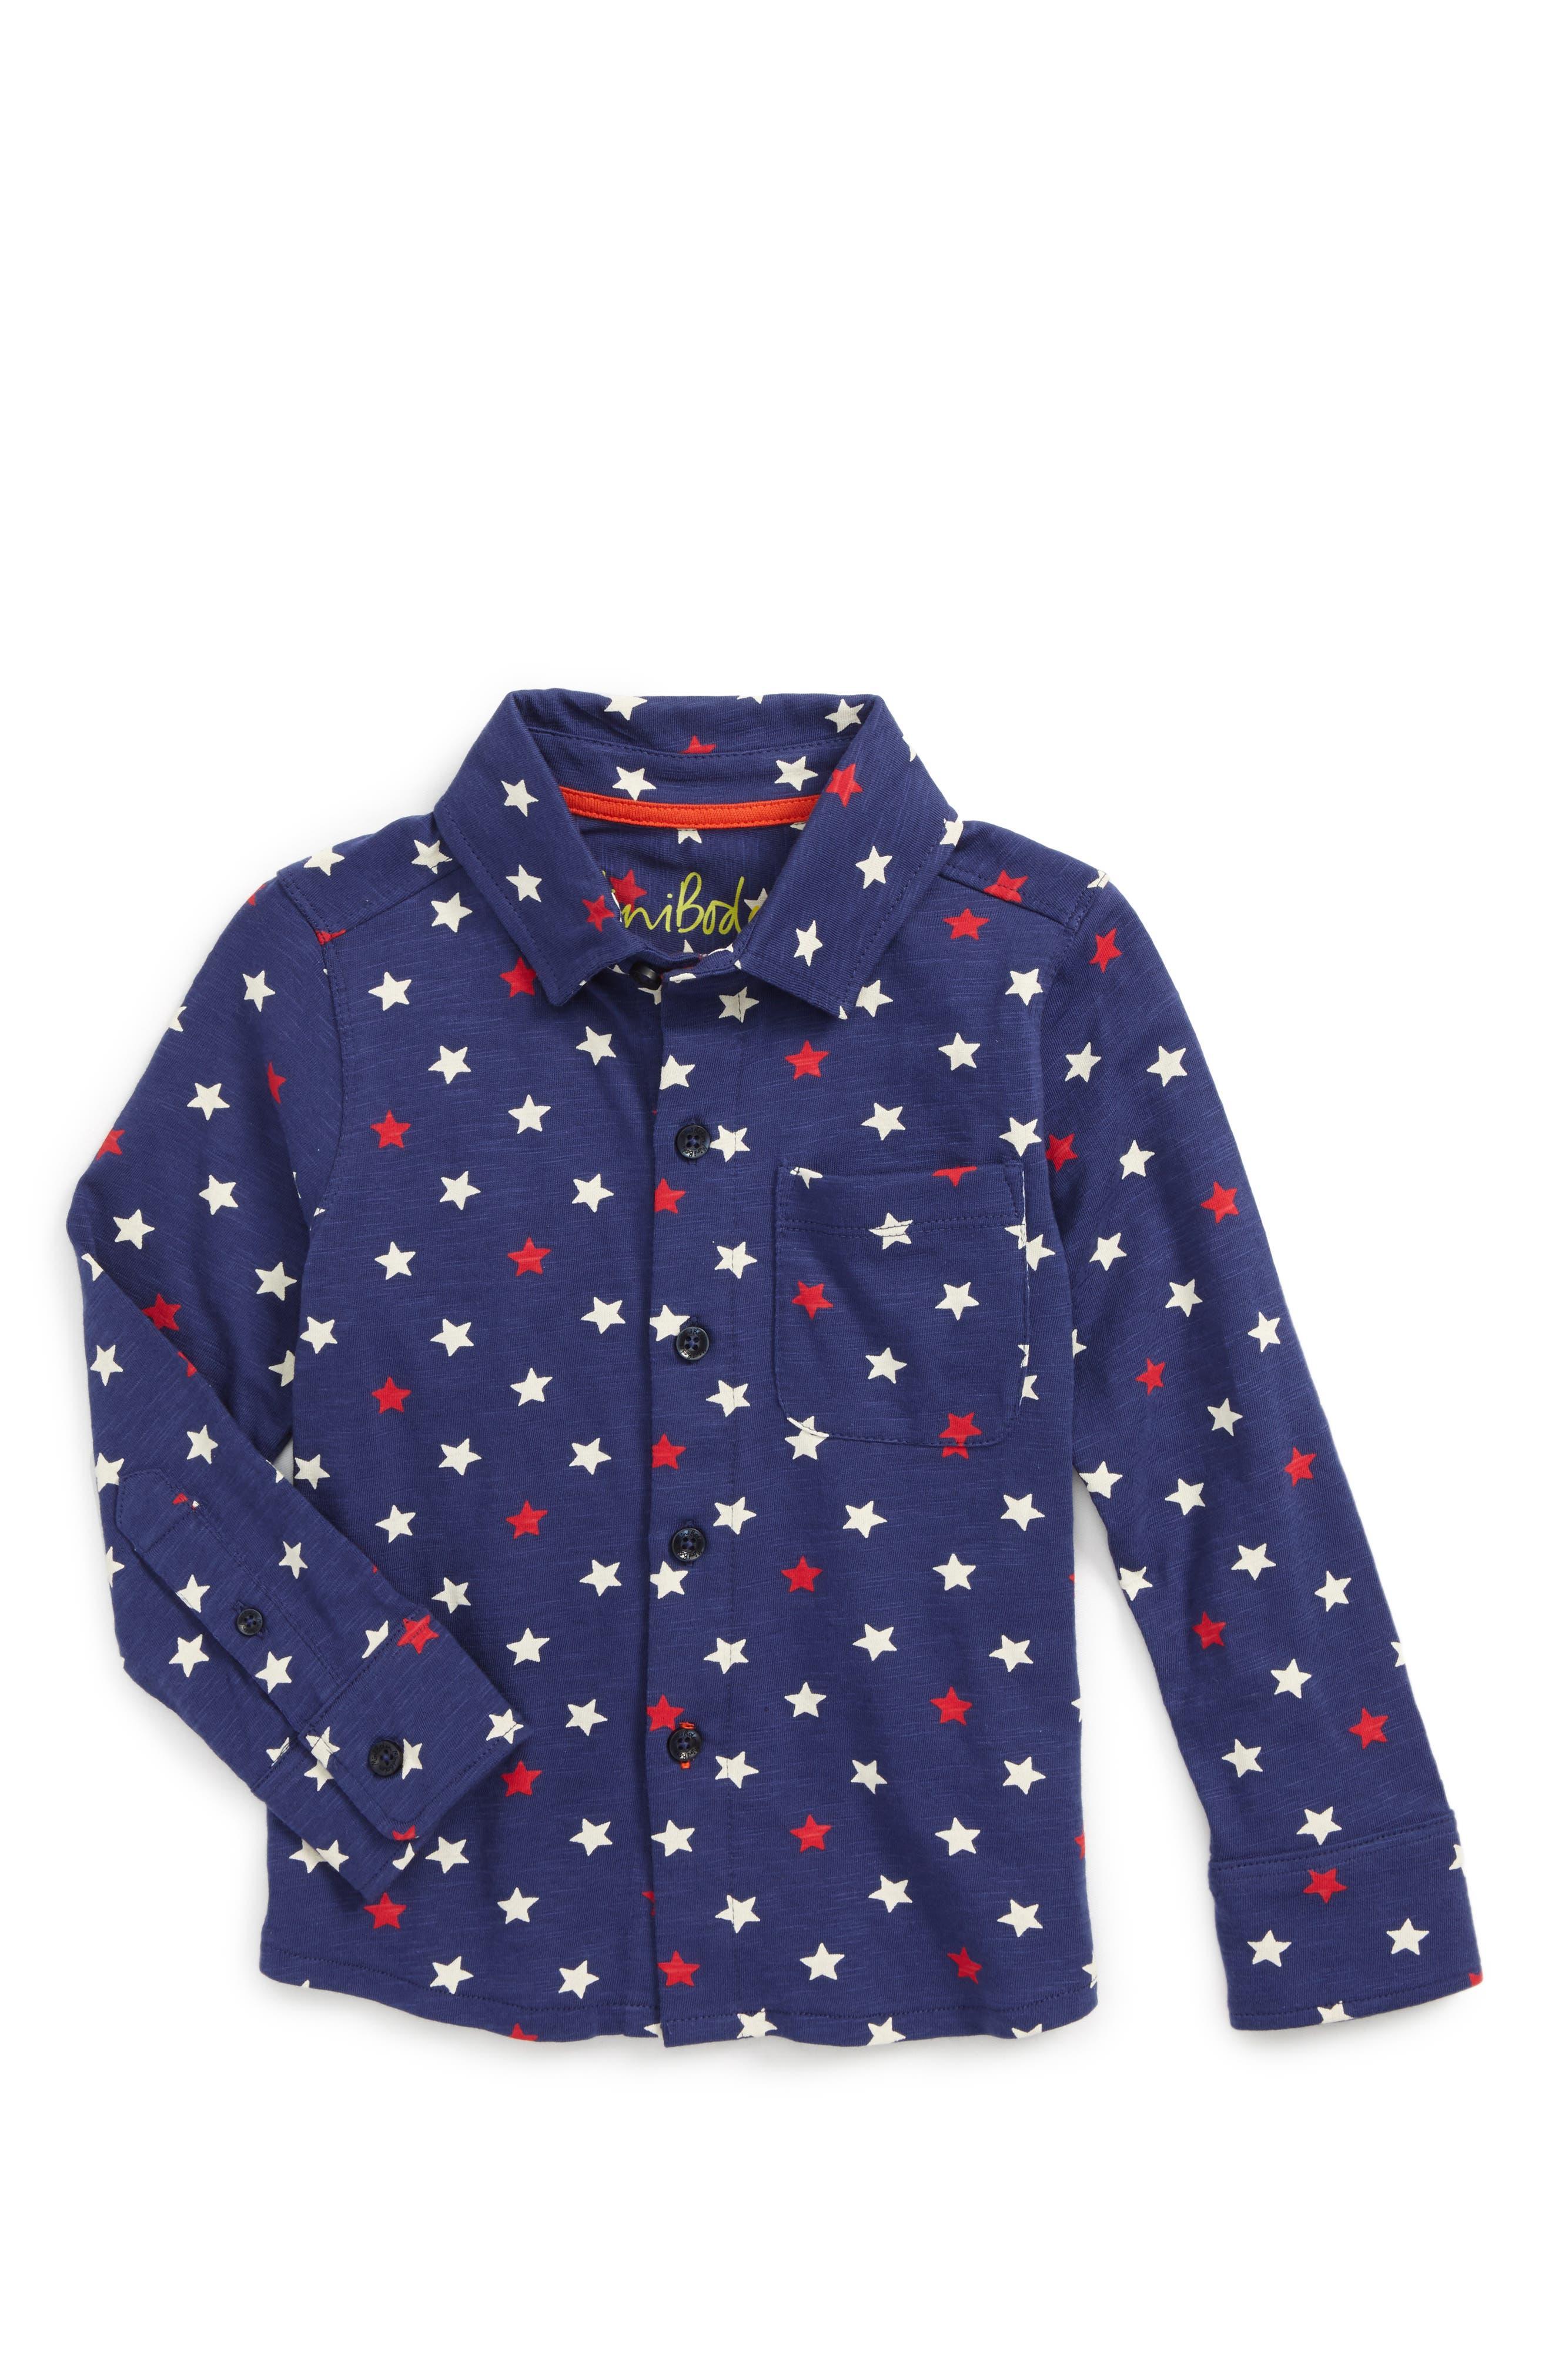 Alternate Image 1 Selected - Mini Boden Star Print Jersey Shirt (Toddler Boys, Little Boys & Big Boys)